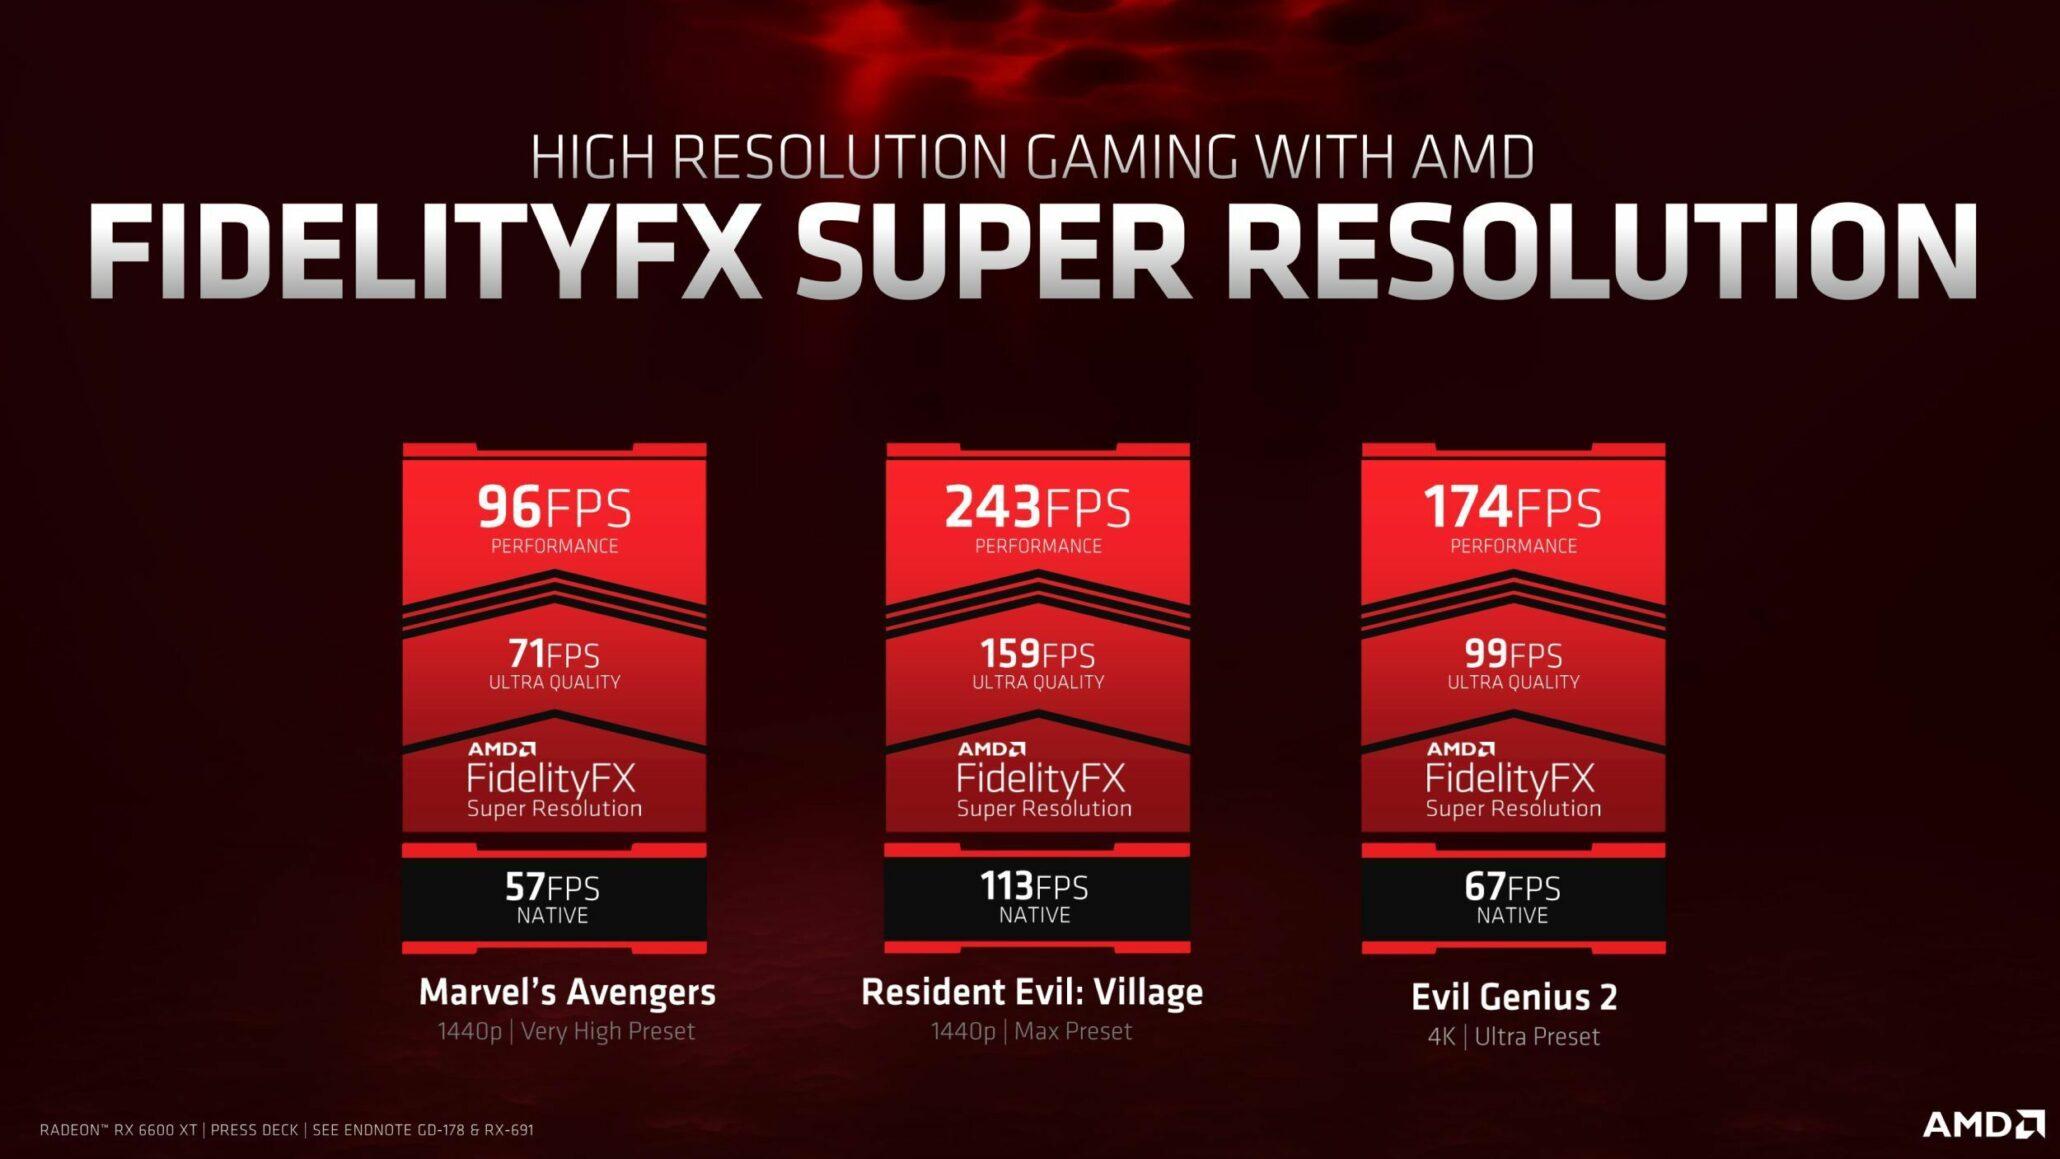 amd-radeon-rx-6600-xt-graphics-card-_performance-_fsr_2